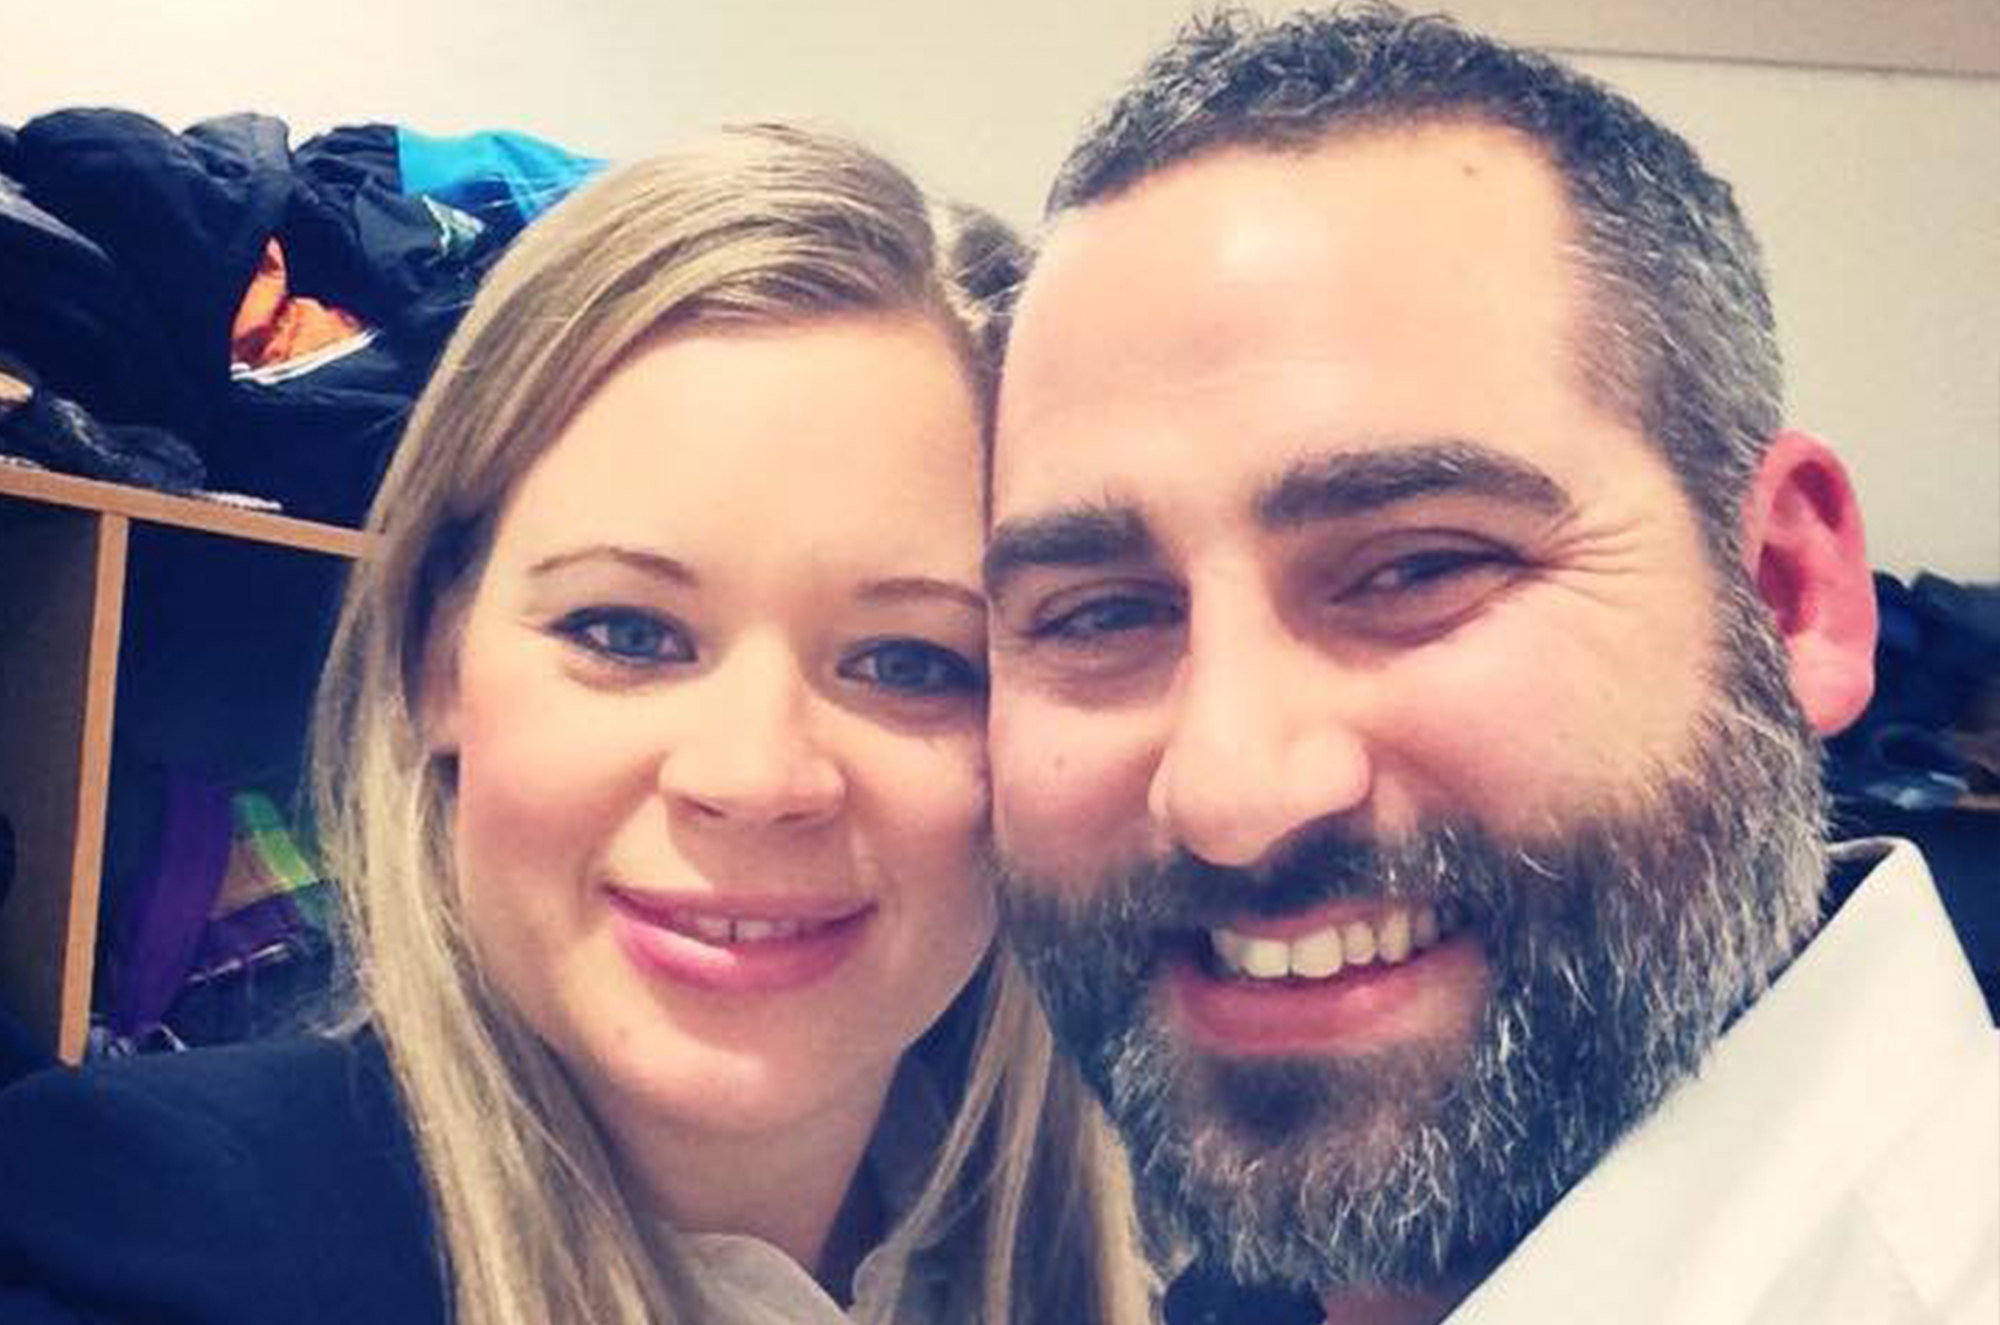 Bishop Joshua und Rebecca Gilliland